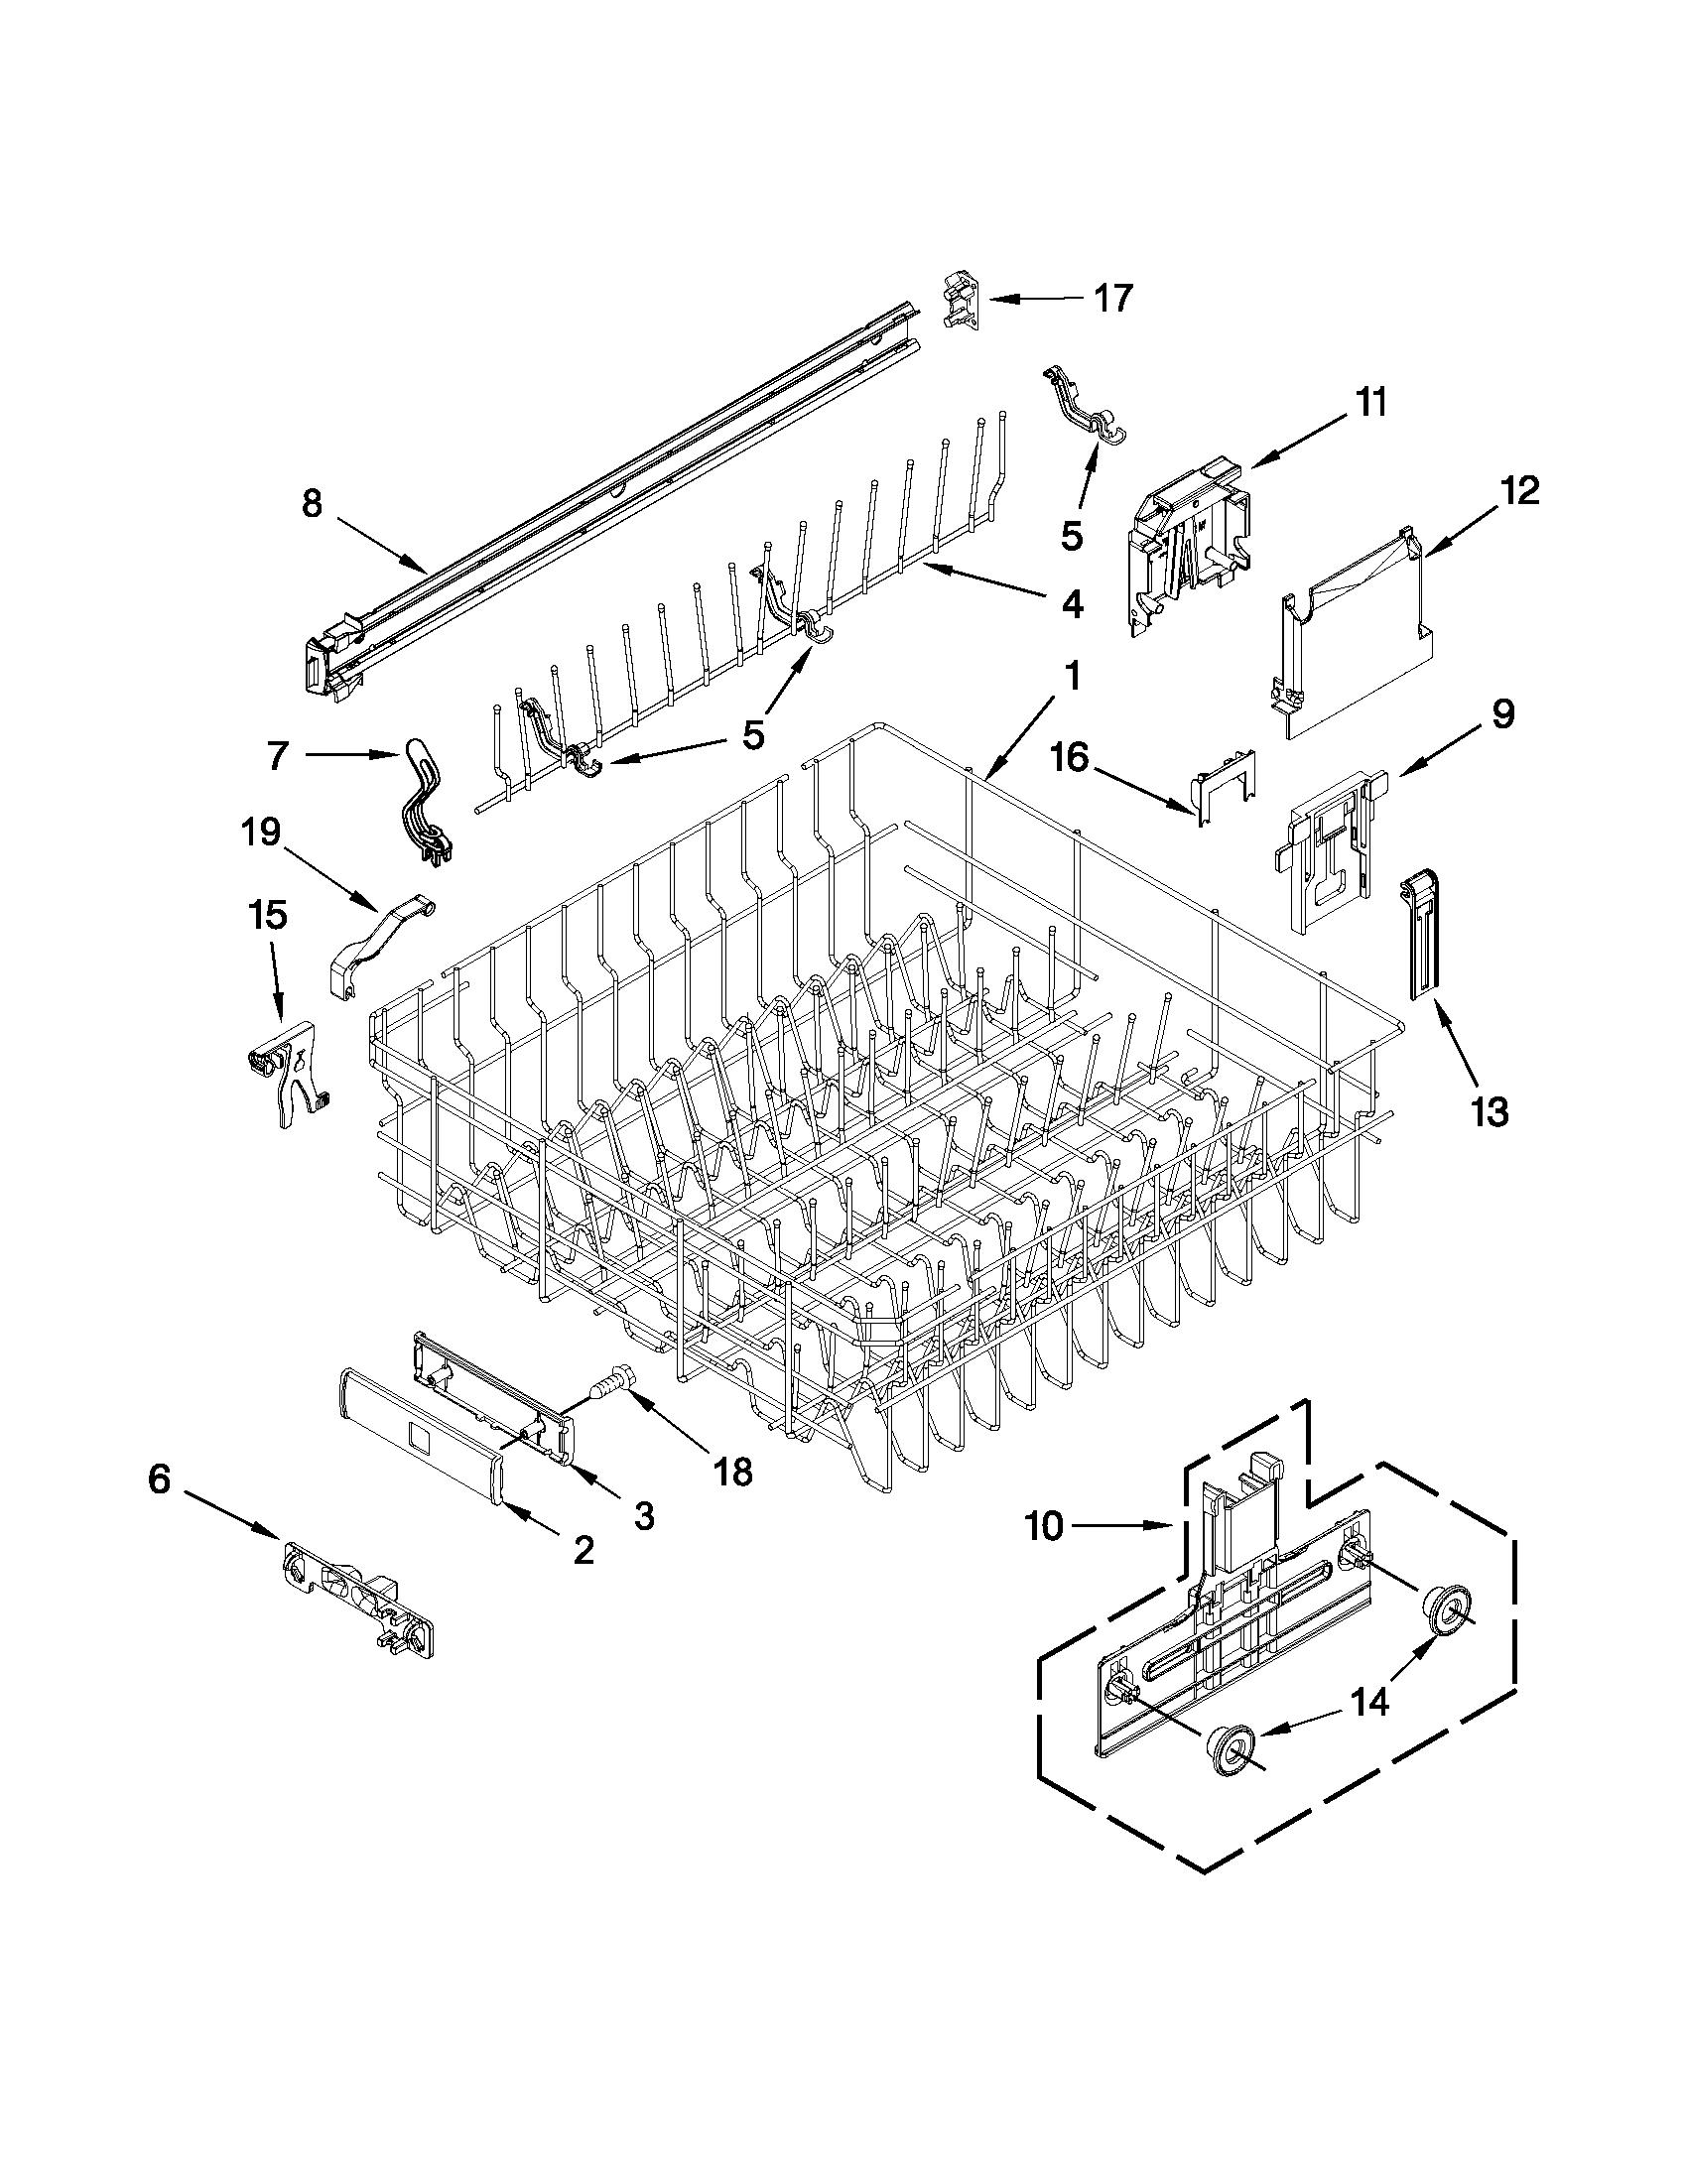 hight resolution of wiring diagram for kenmore elite dishwasher data schematic diagram kenmore elite dishwasher model 66512769k310 upper rack